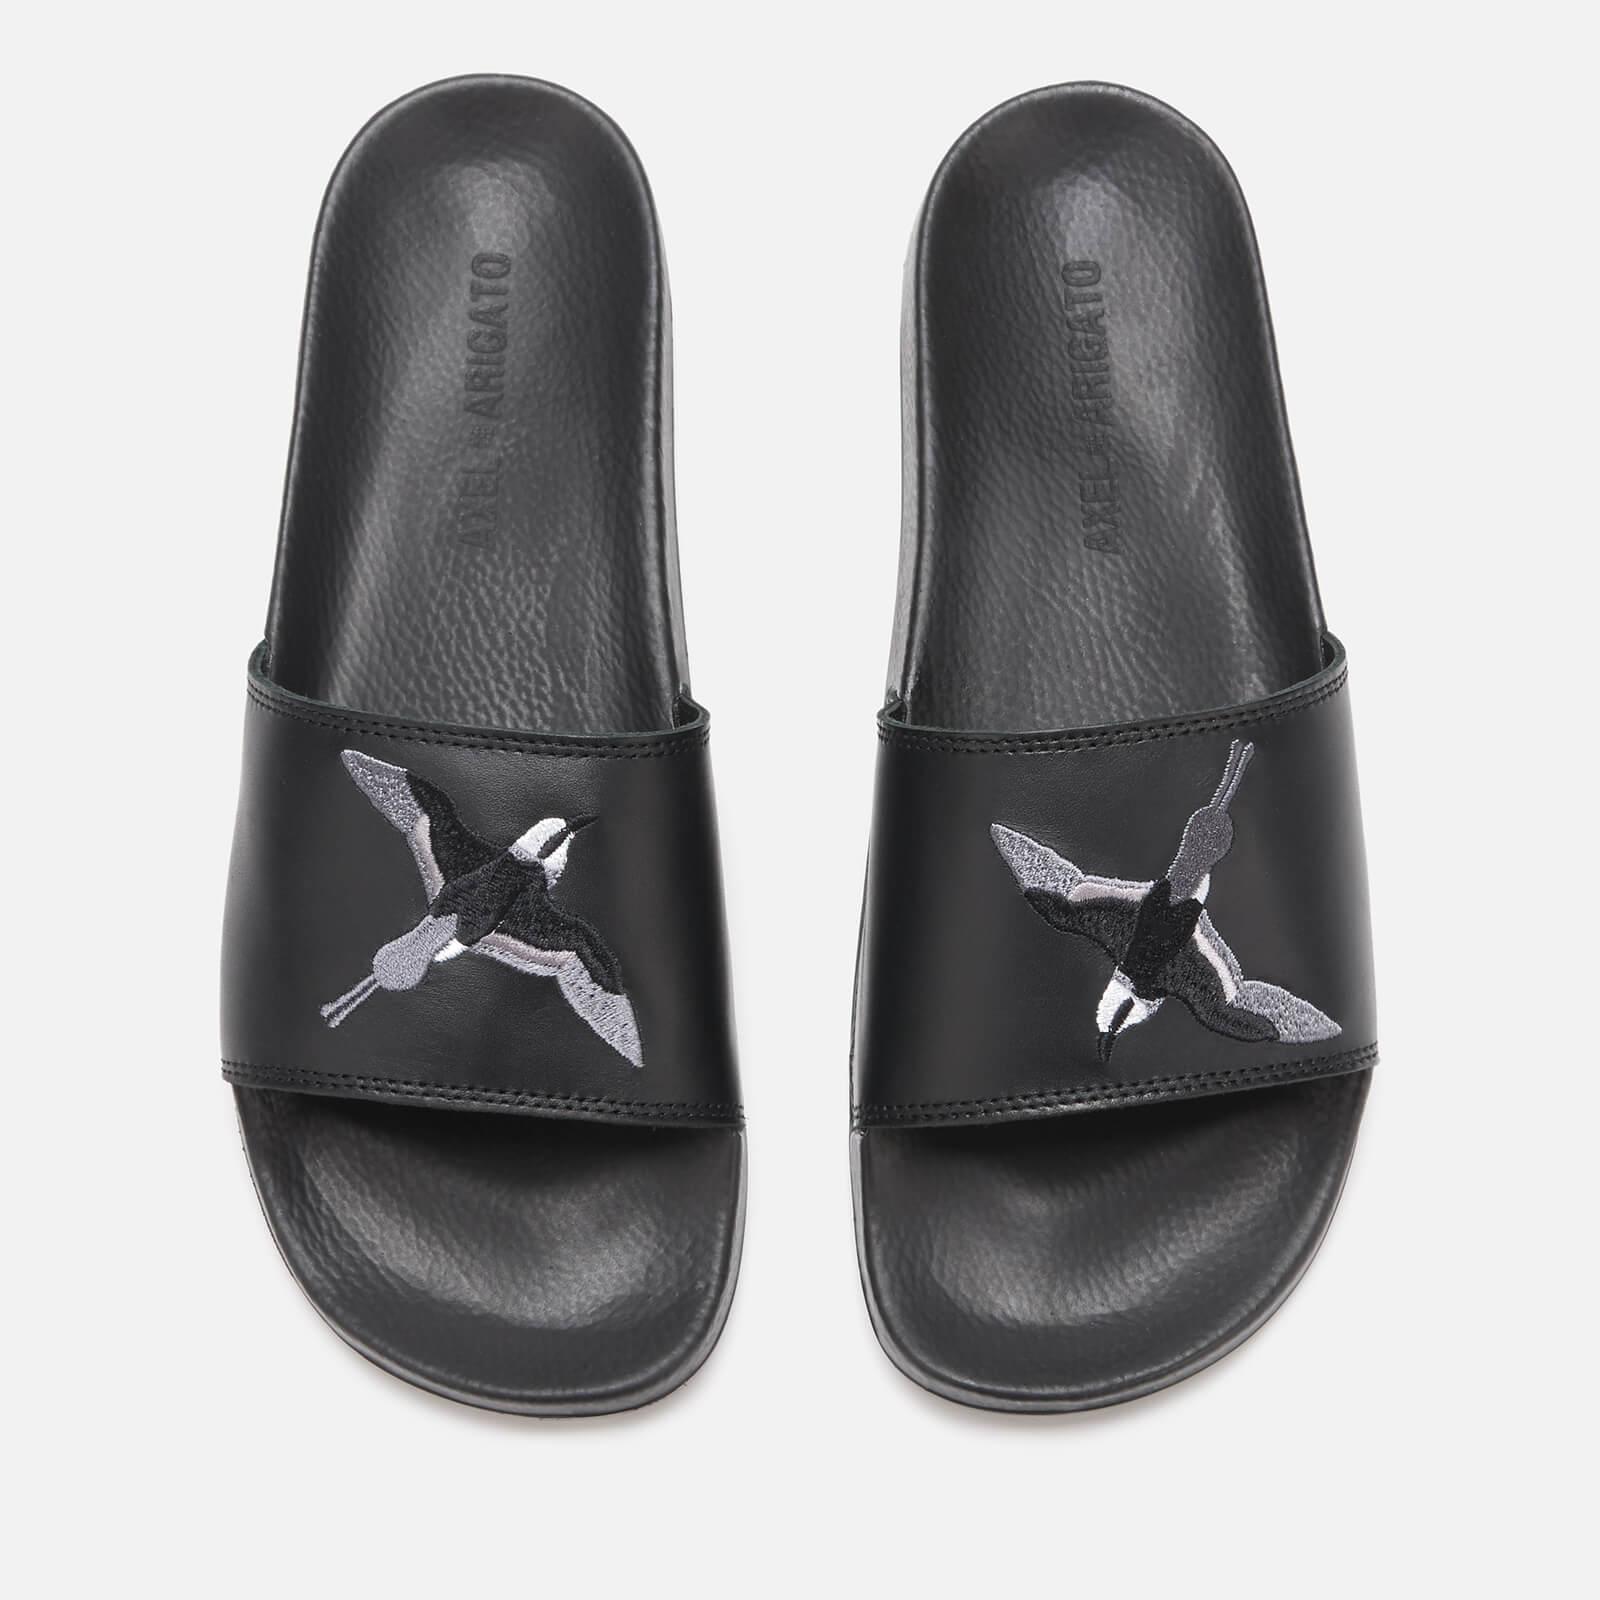 Sandals Men's Slide Black Axel Arigato O0kXNP8nw